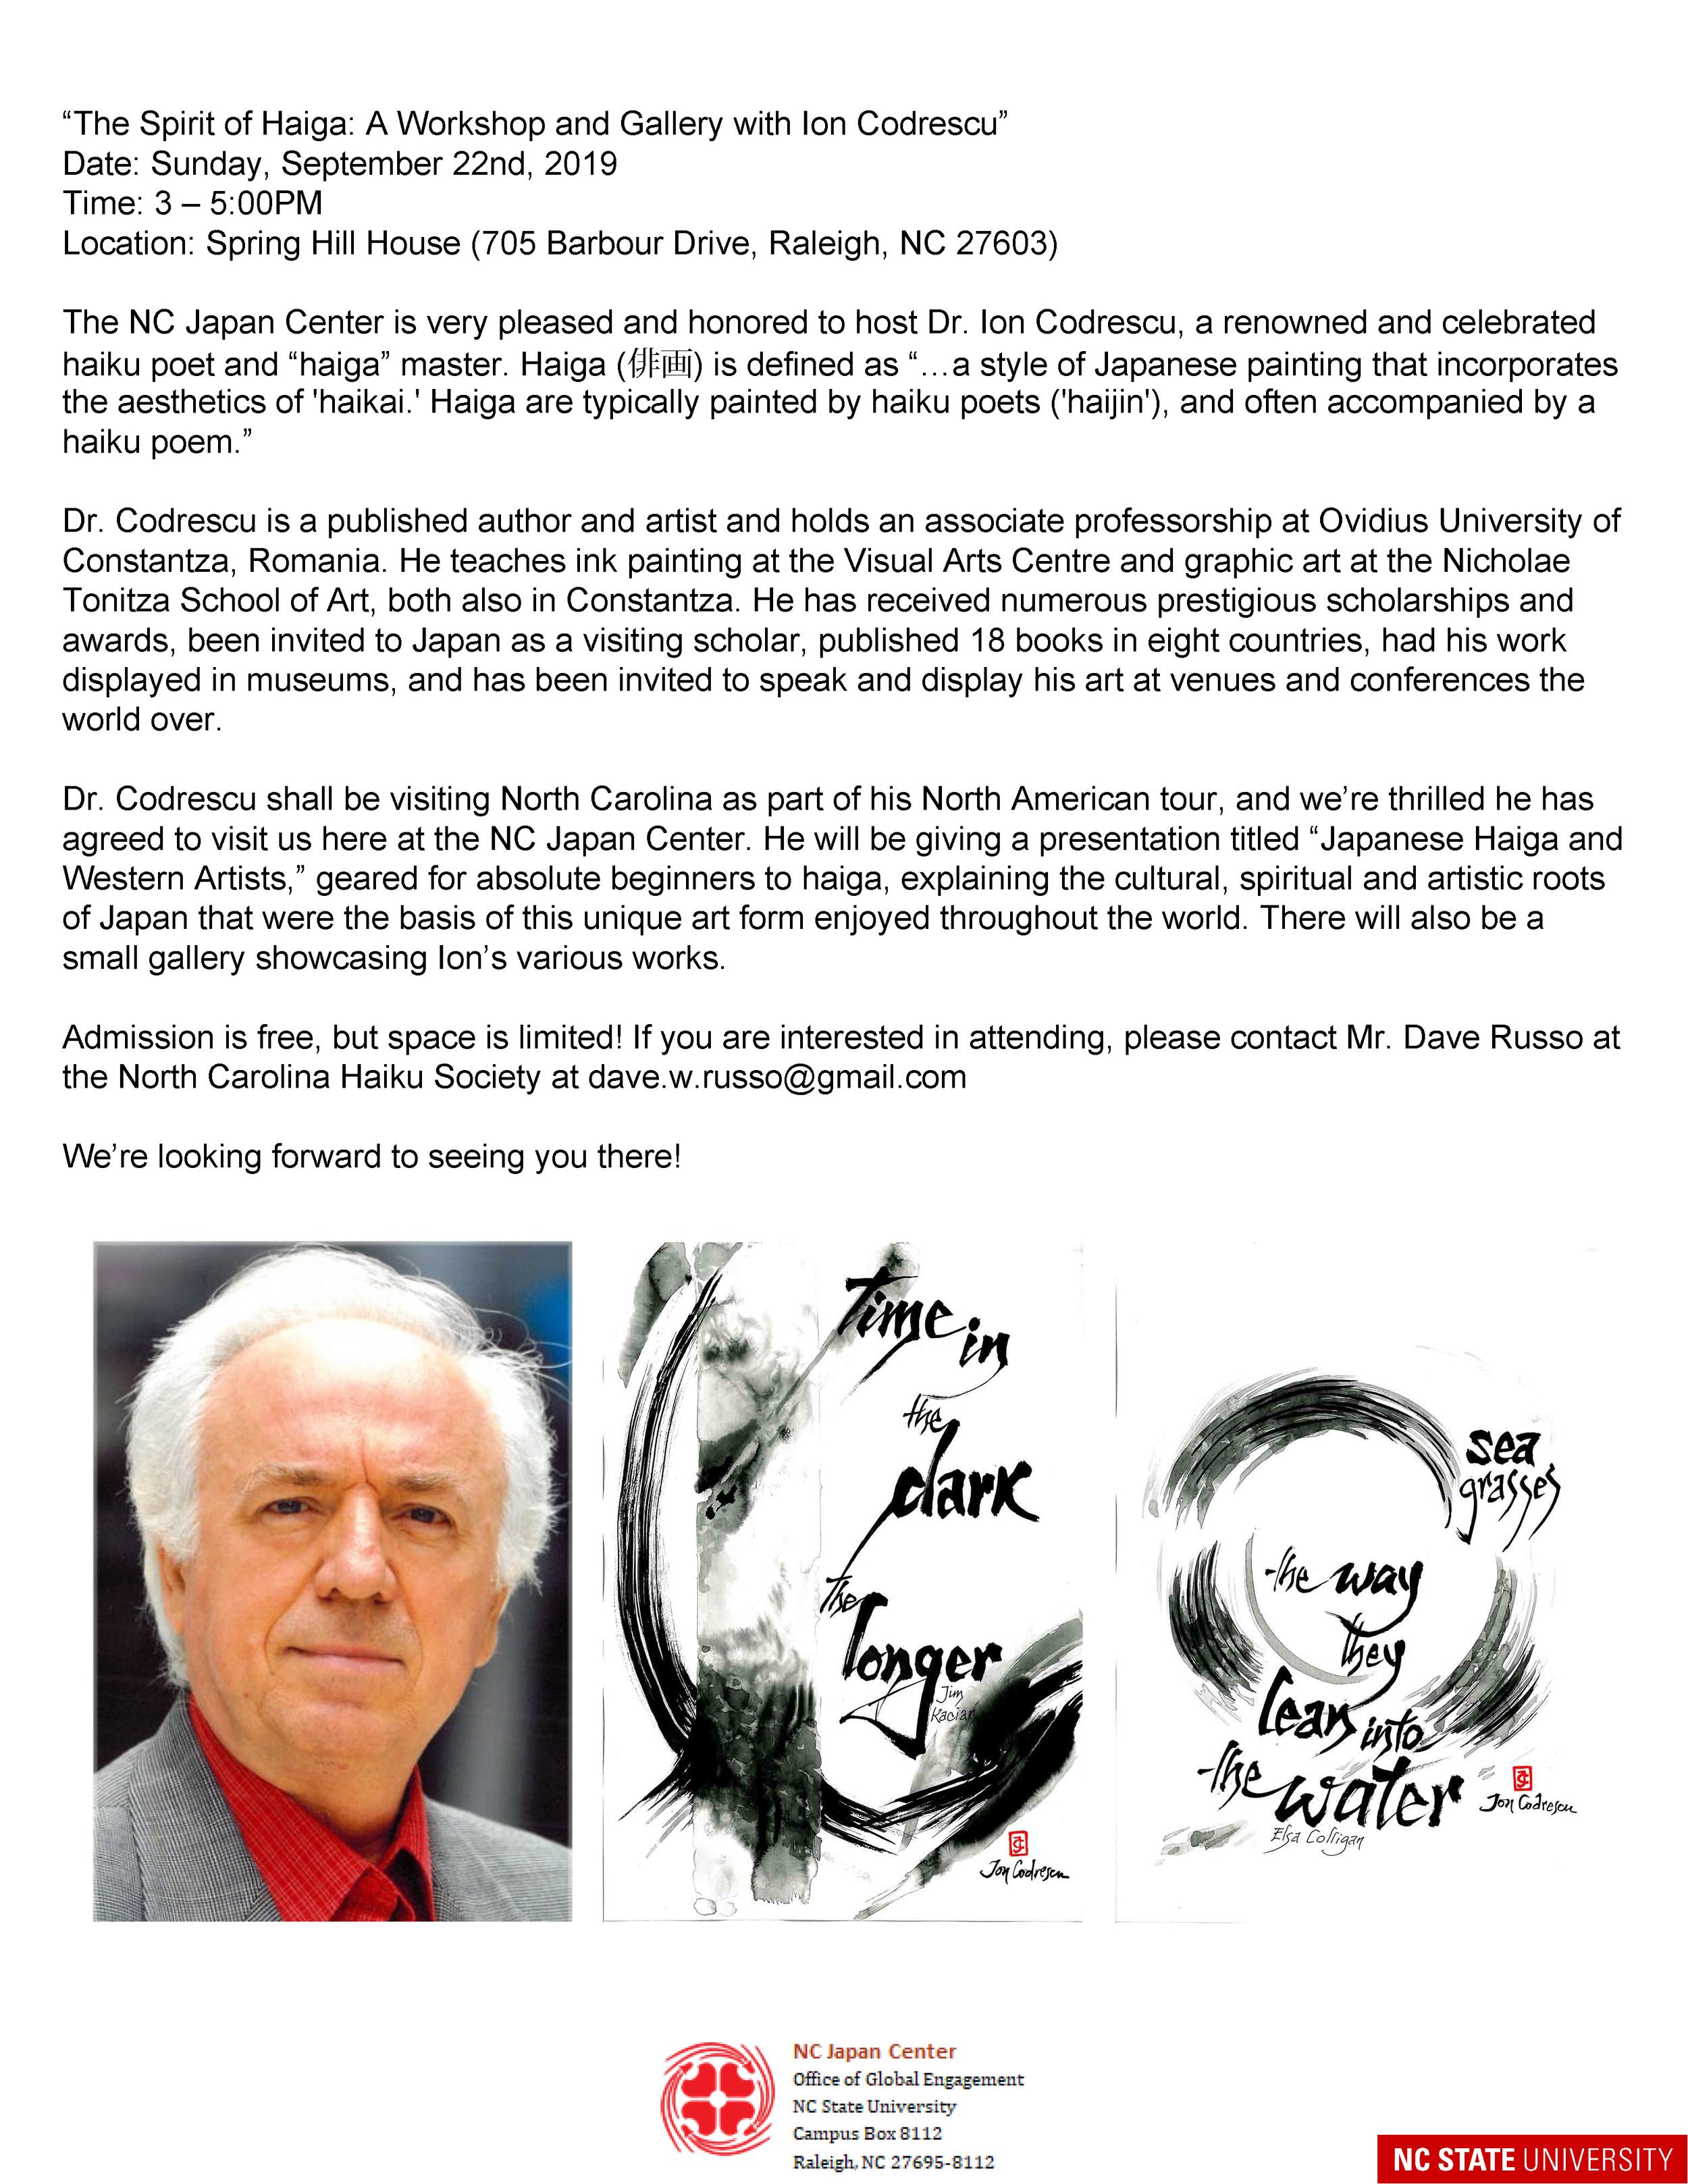 Ion Codrescu Event Flyer Sept 2019.png